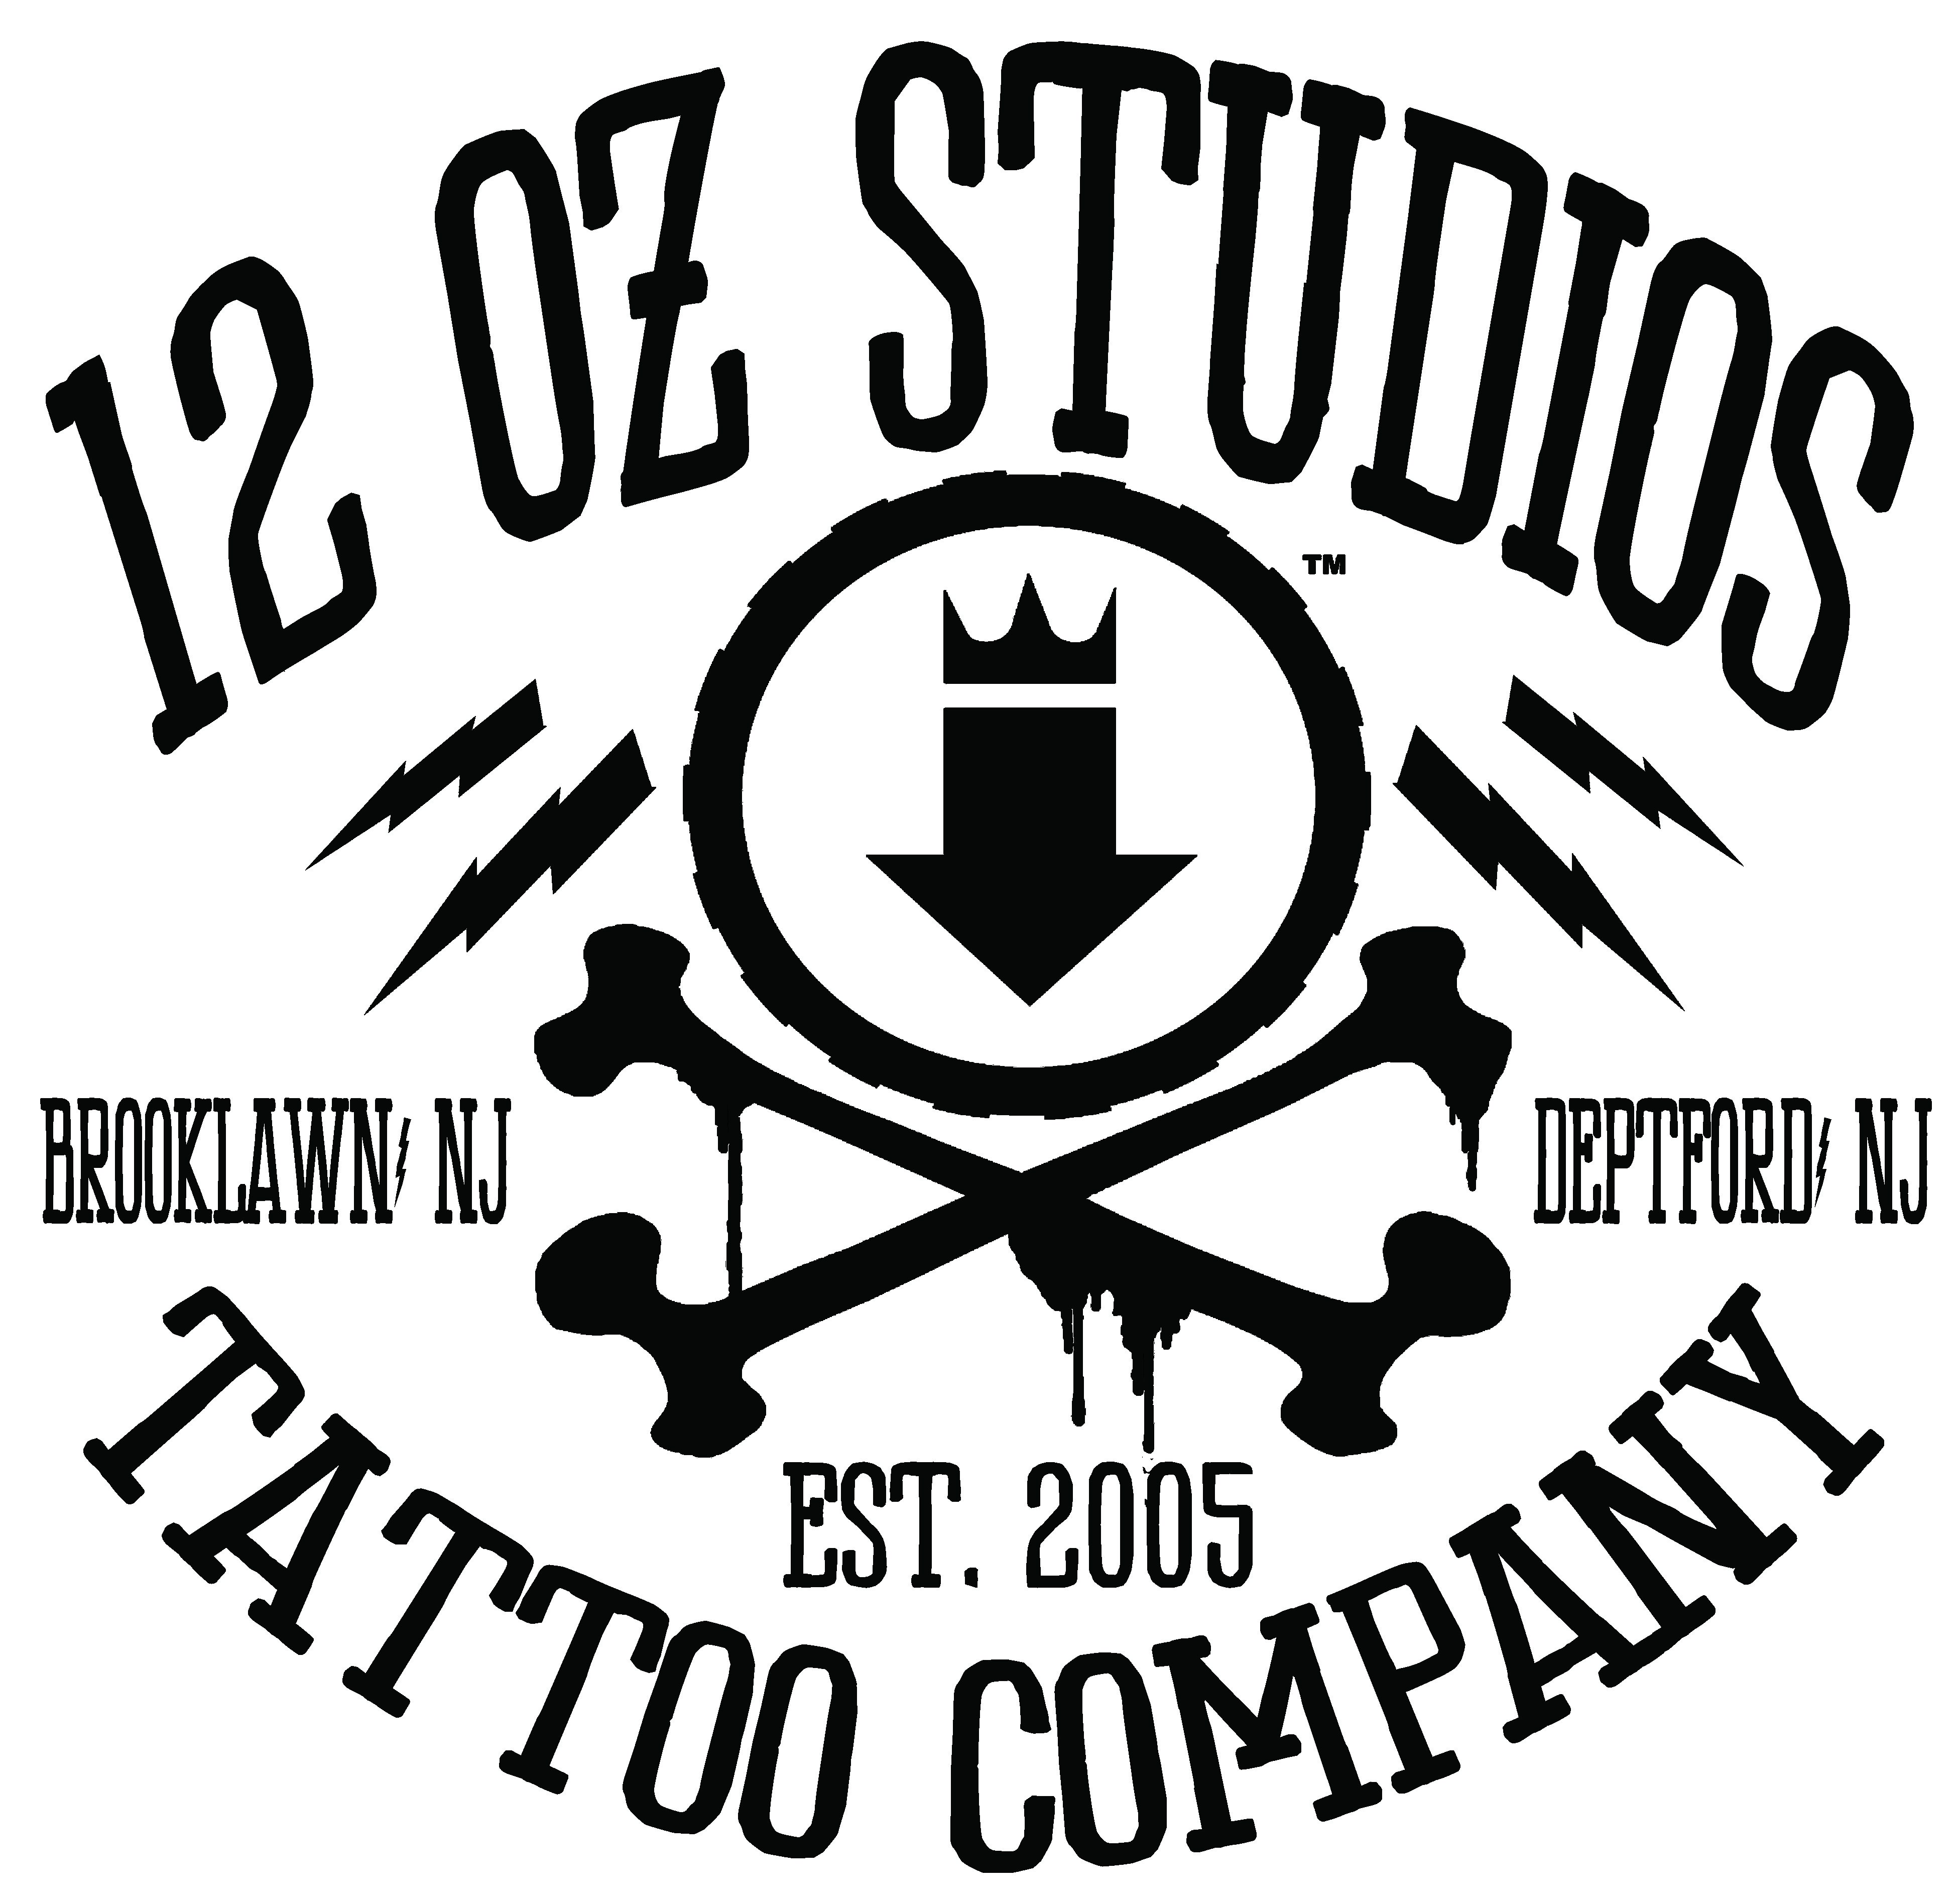 12 oz. Studios